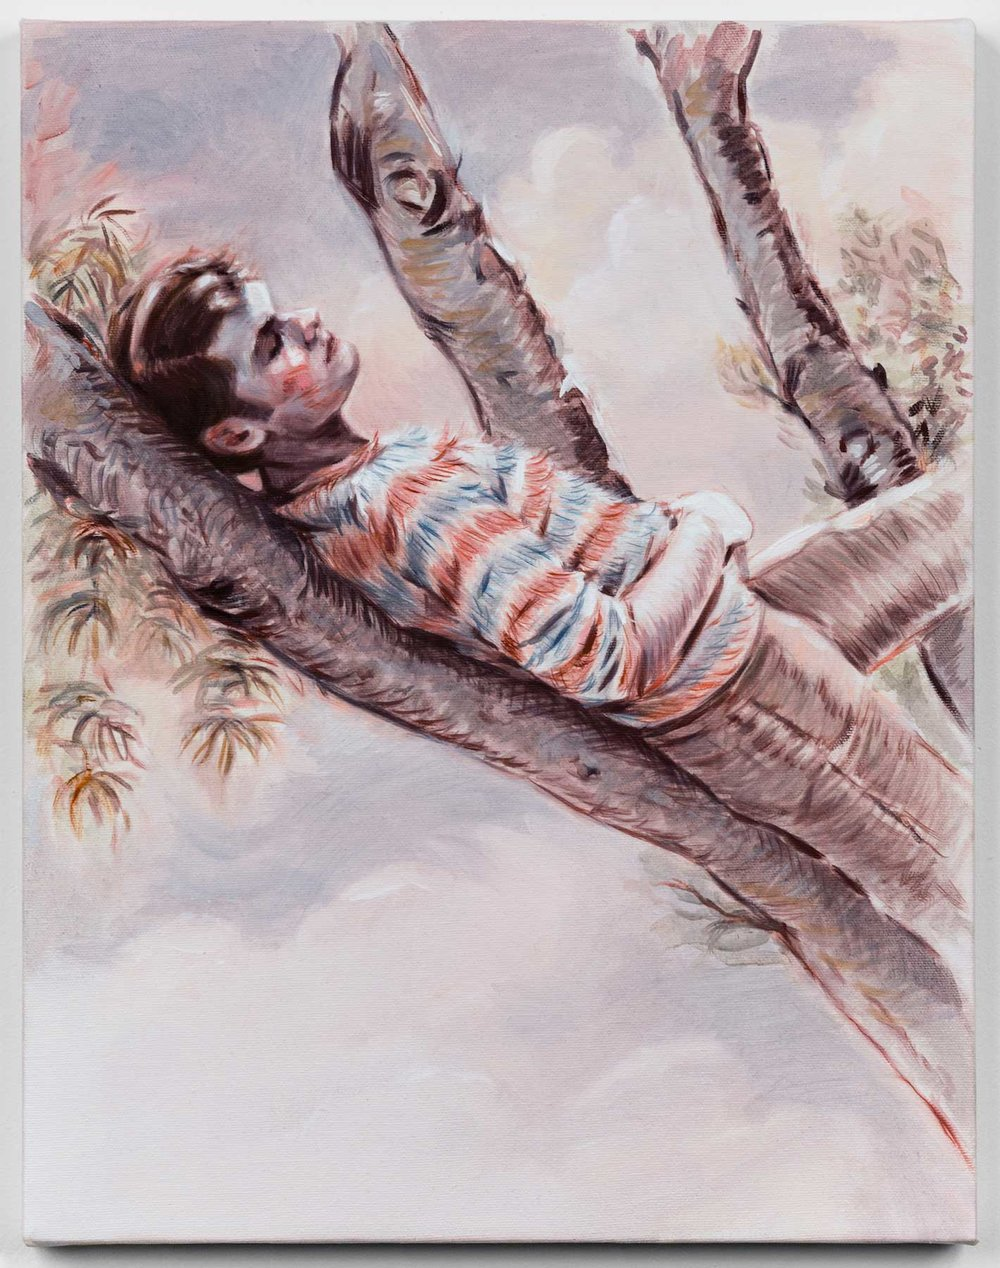 Caterpillar,2016, oil on canvas,18 x 14 in